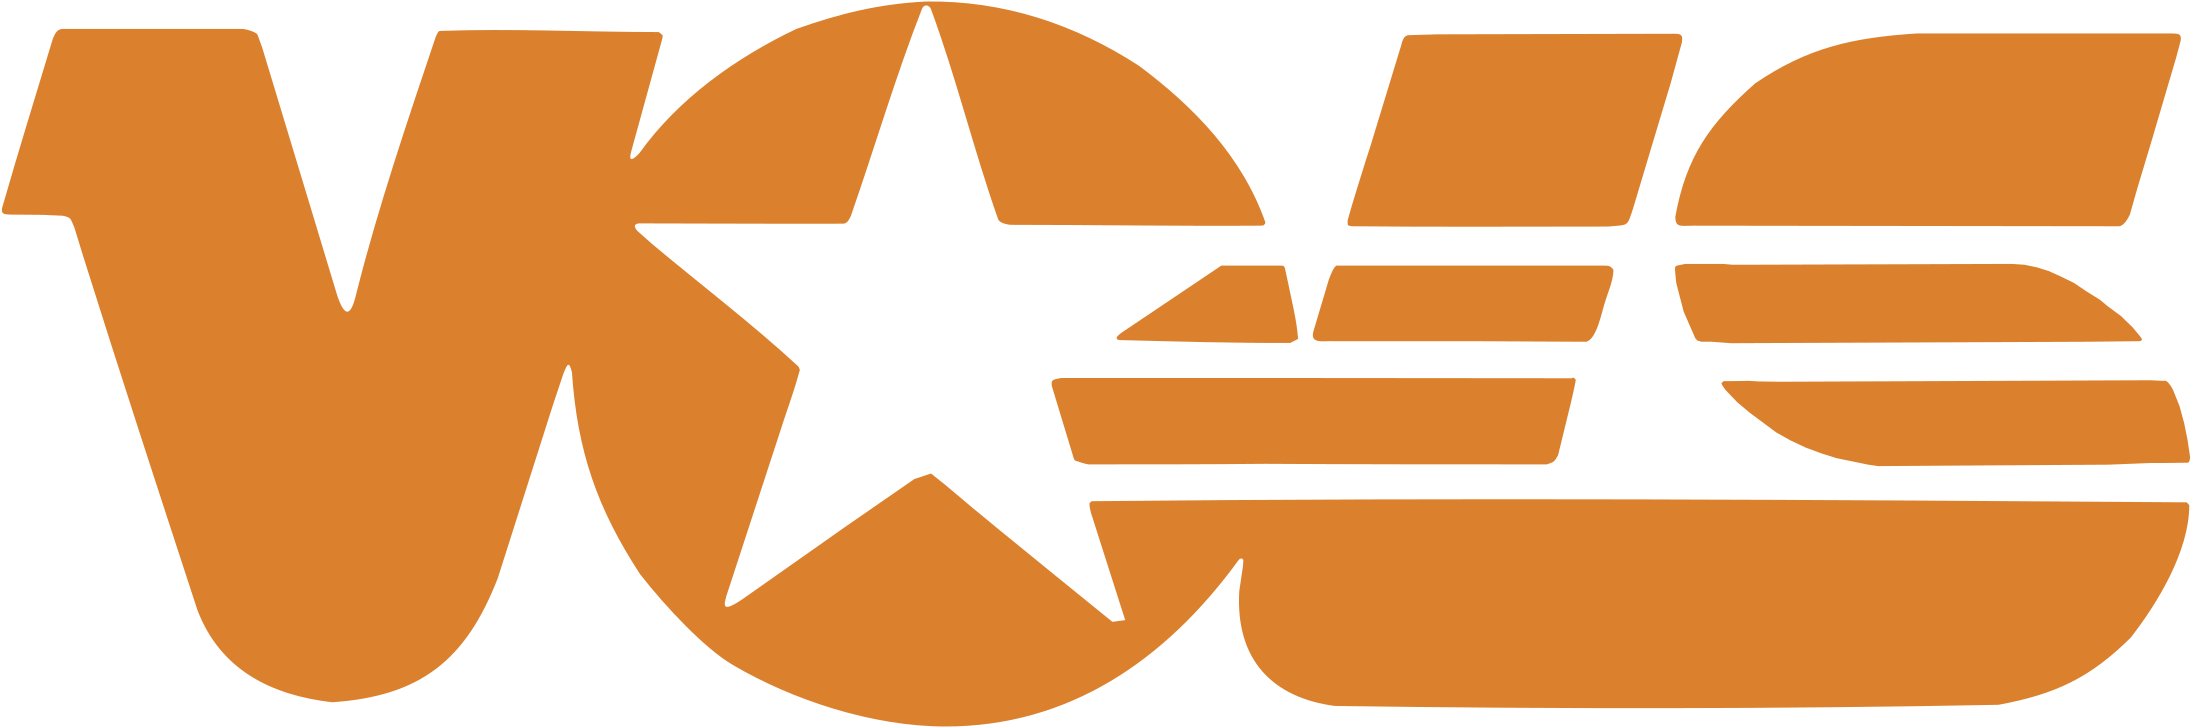 HD Tennessee Vols Logo Png Transparent.